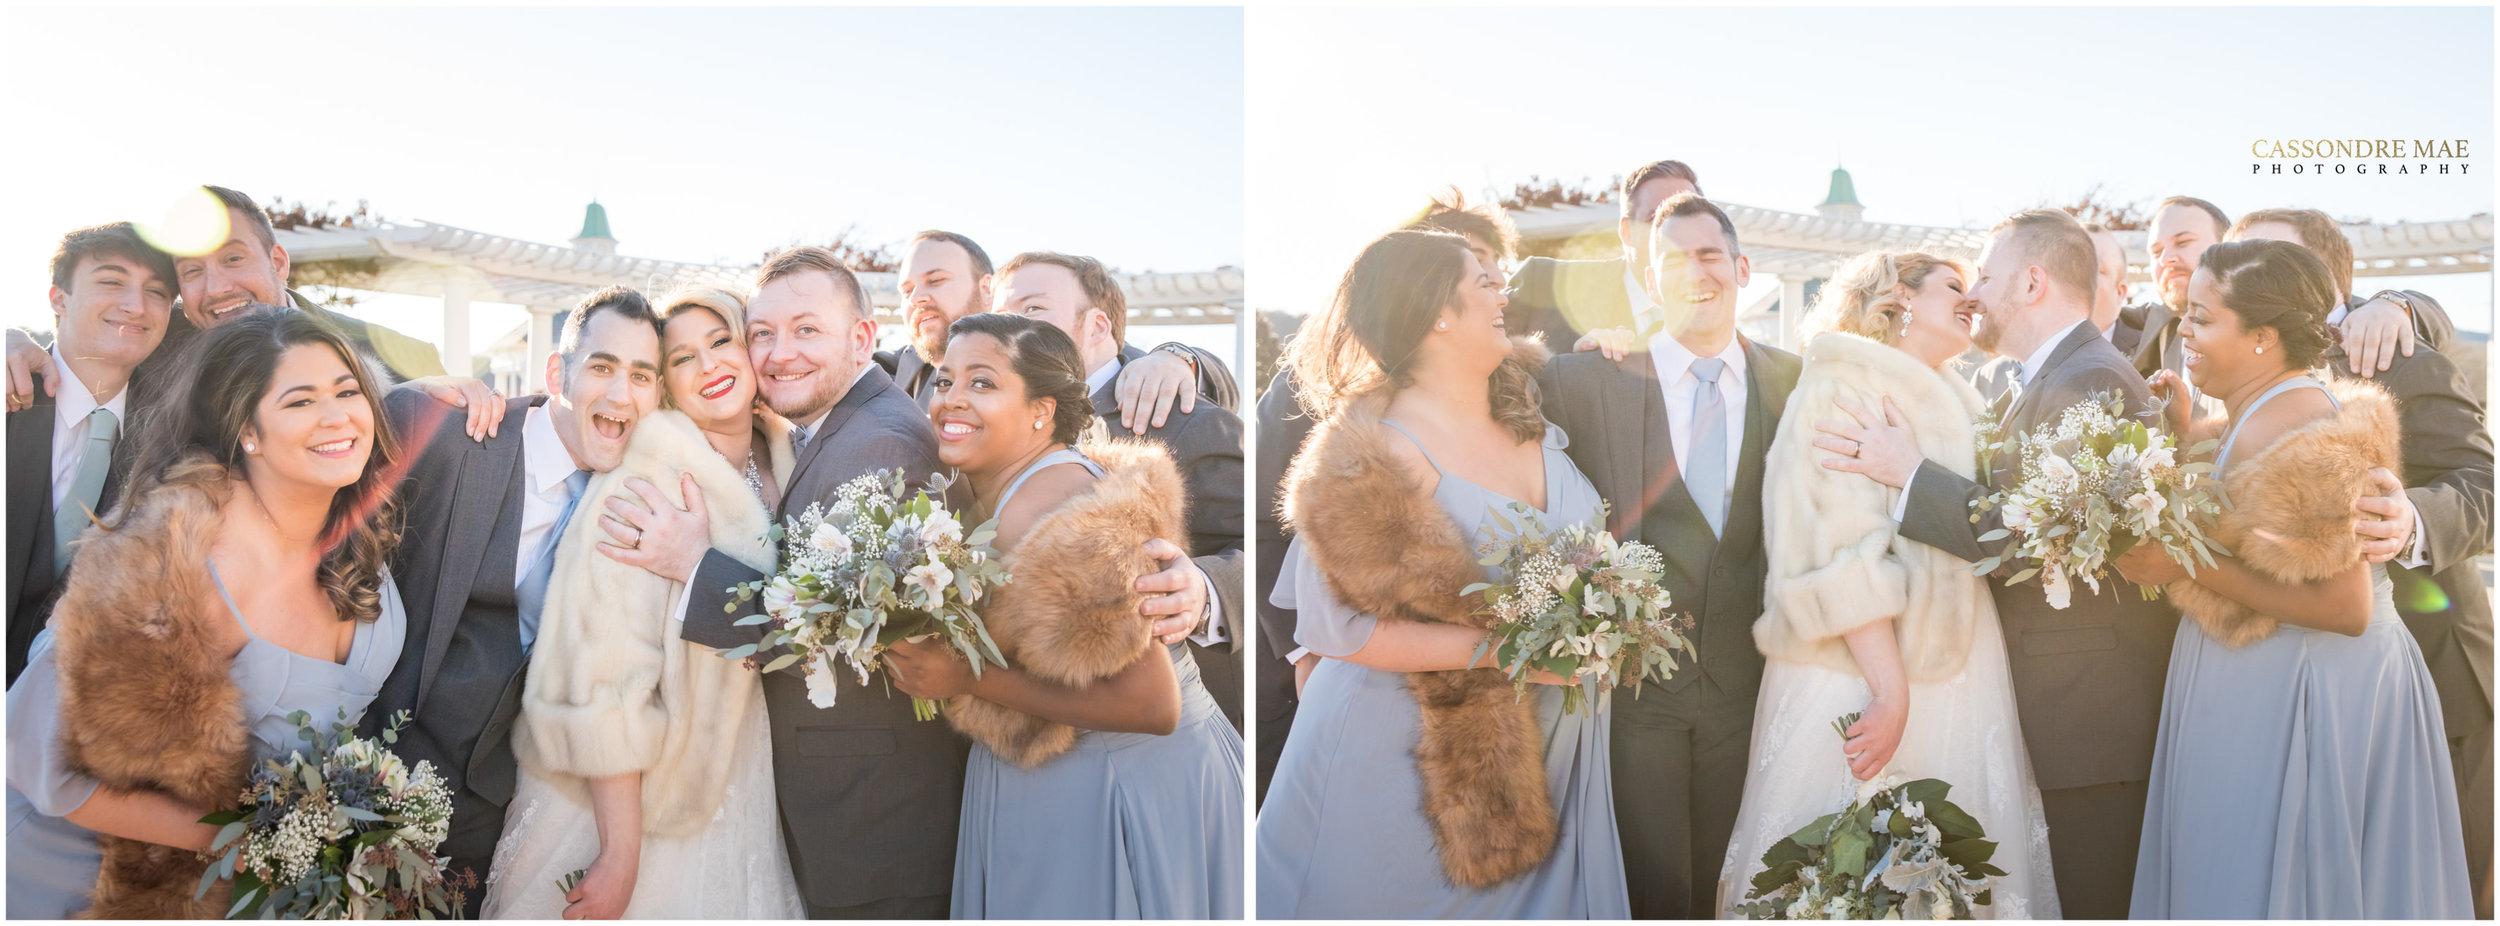 Cassondre Mae Photography Poughkeepsie NY Wedding 24.jpg